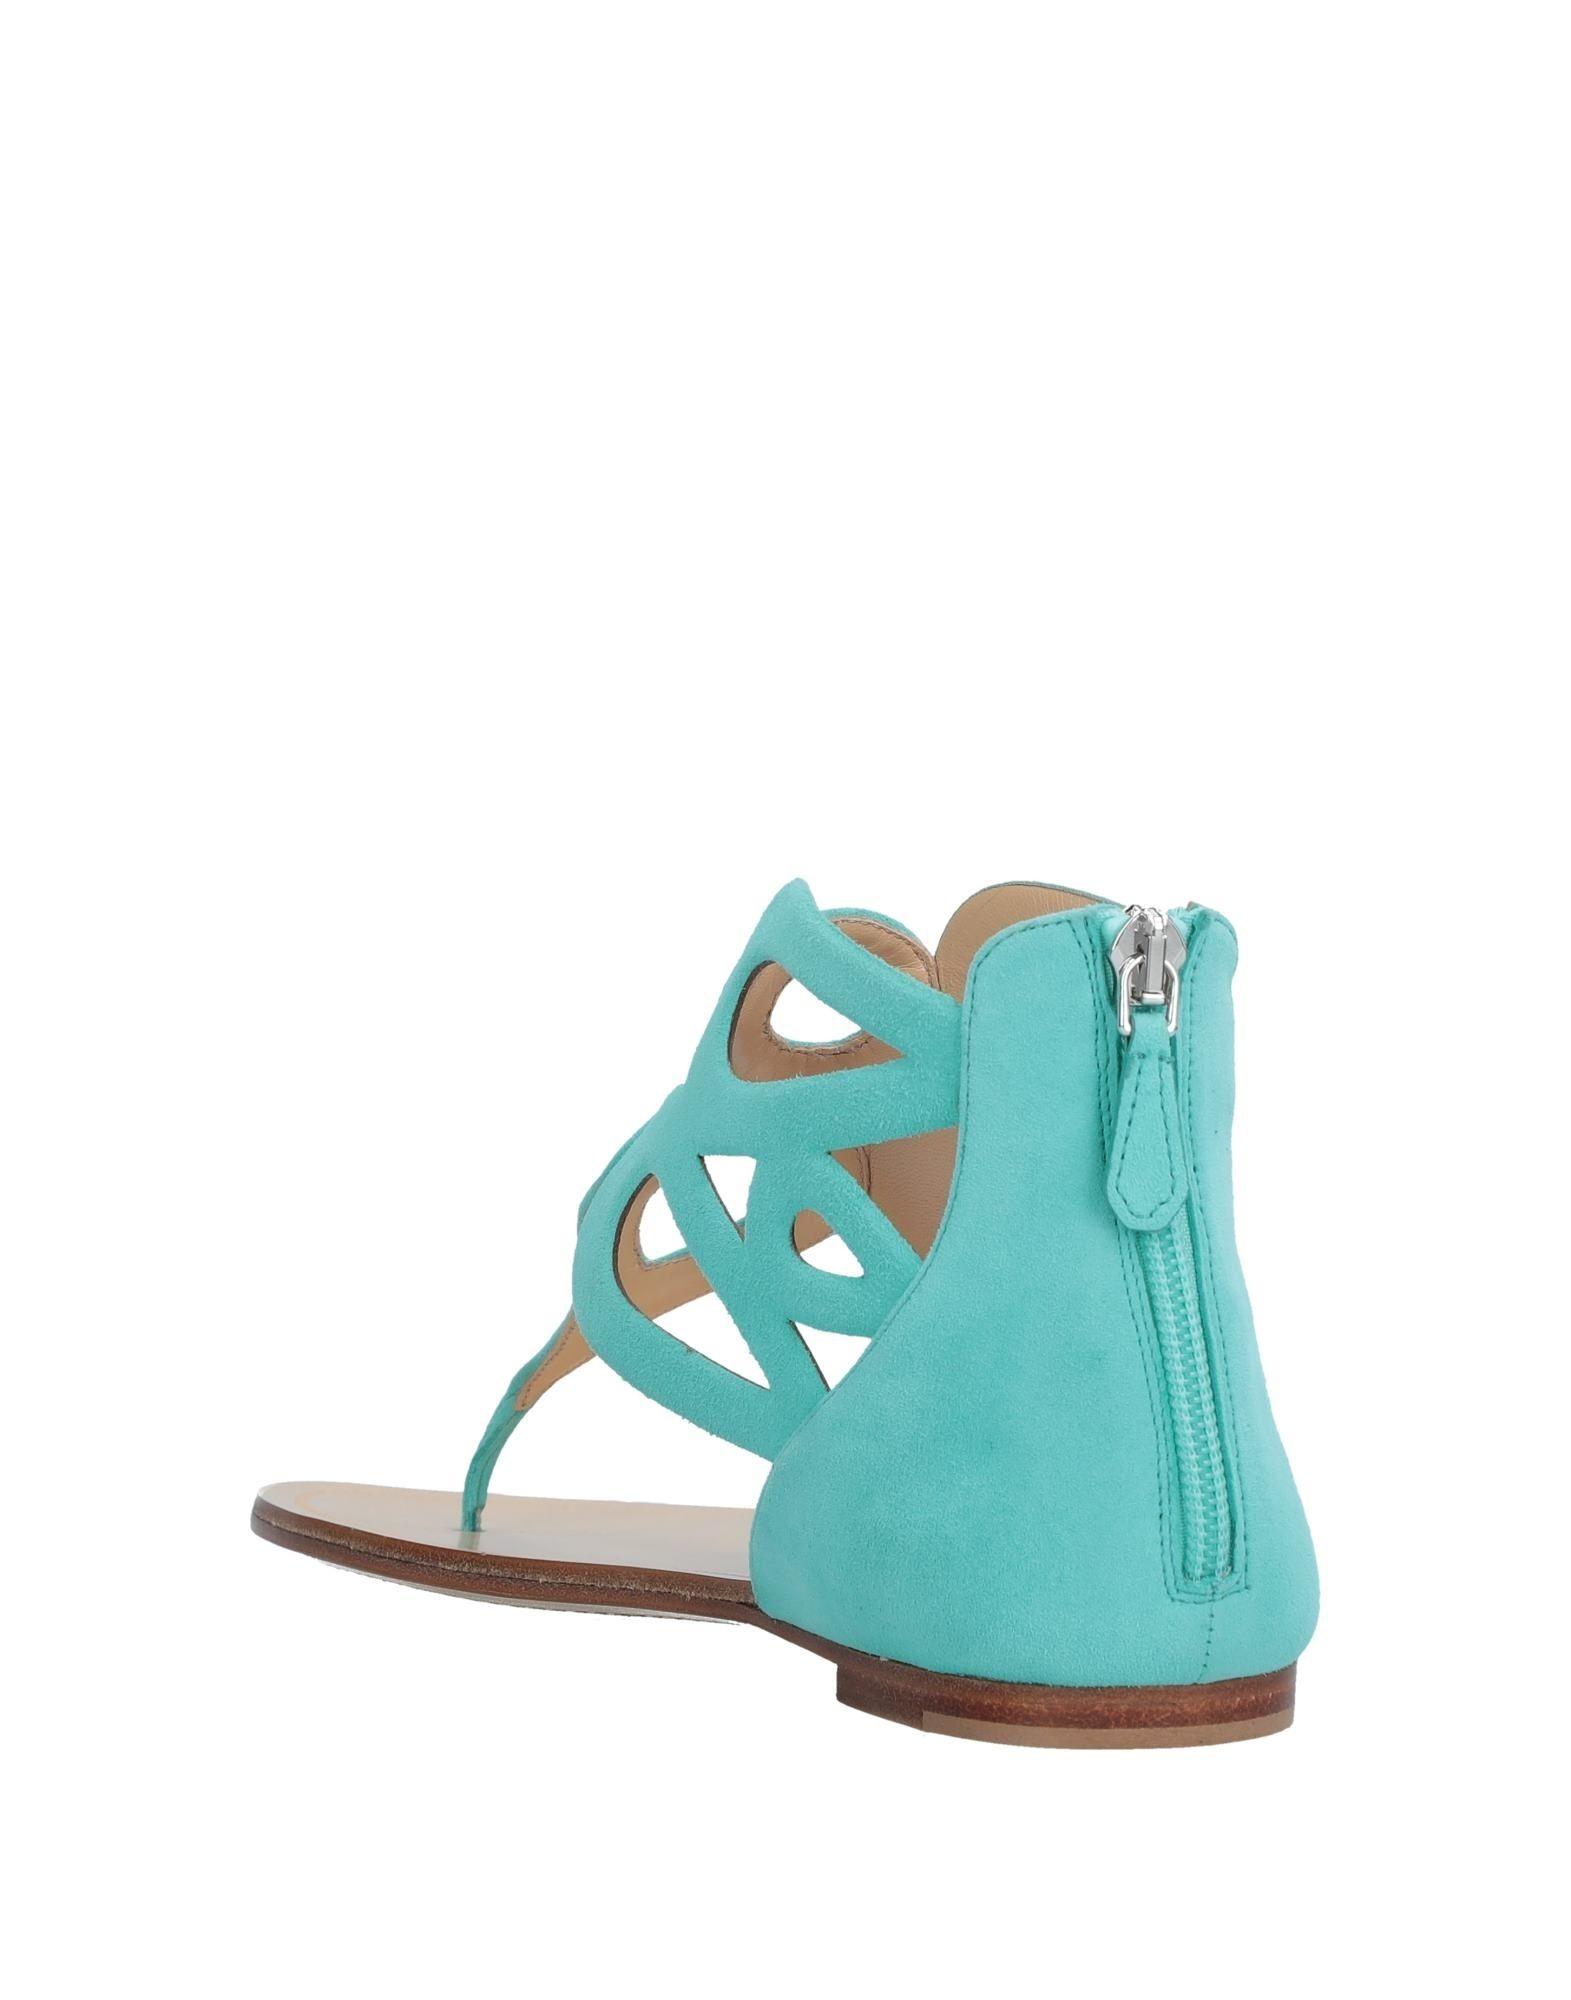 Stilvolle billige  Schuhe Semilla Dianetten Damen  billige 11190432CQ 53fbcb